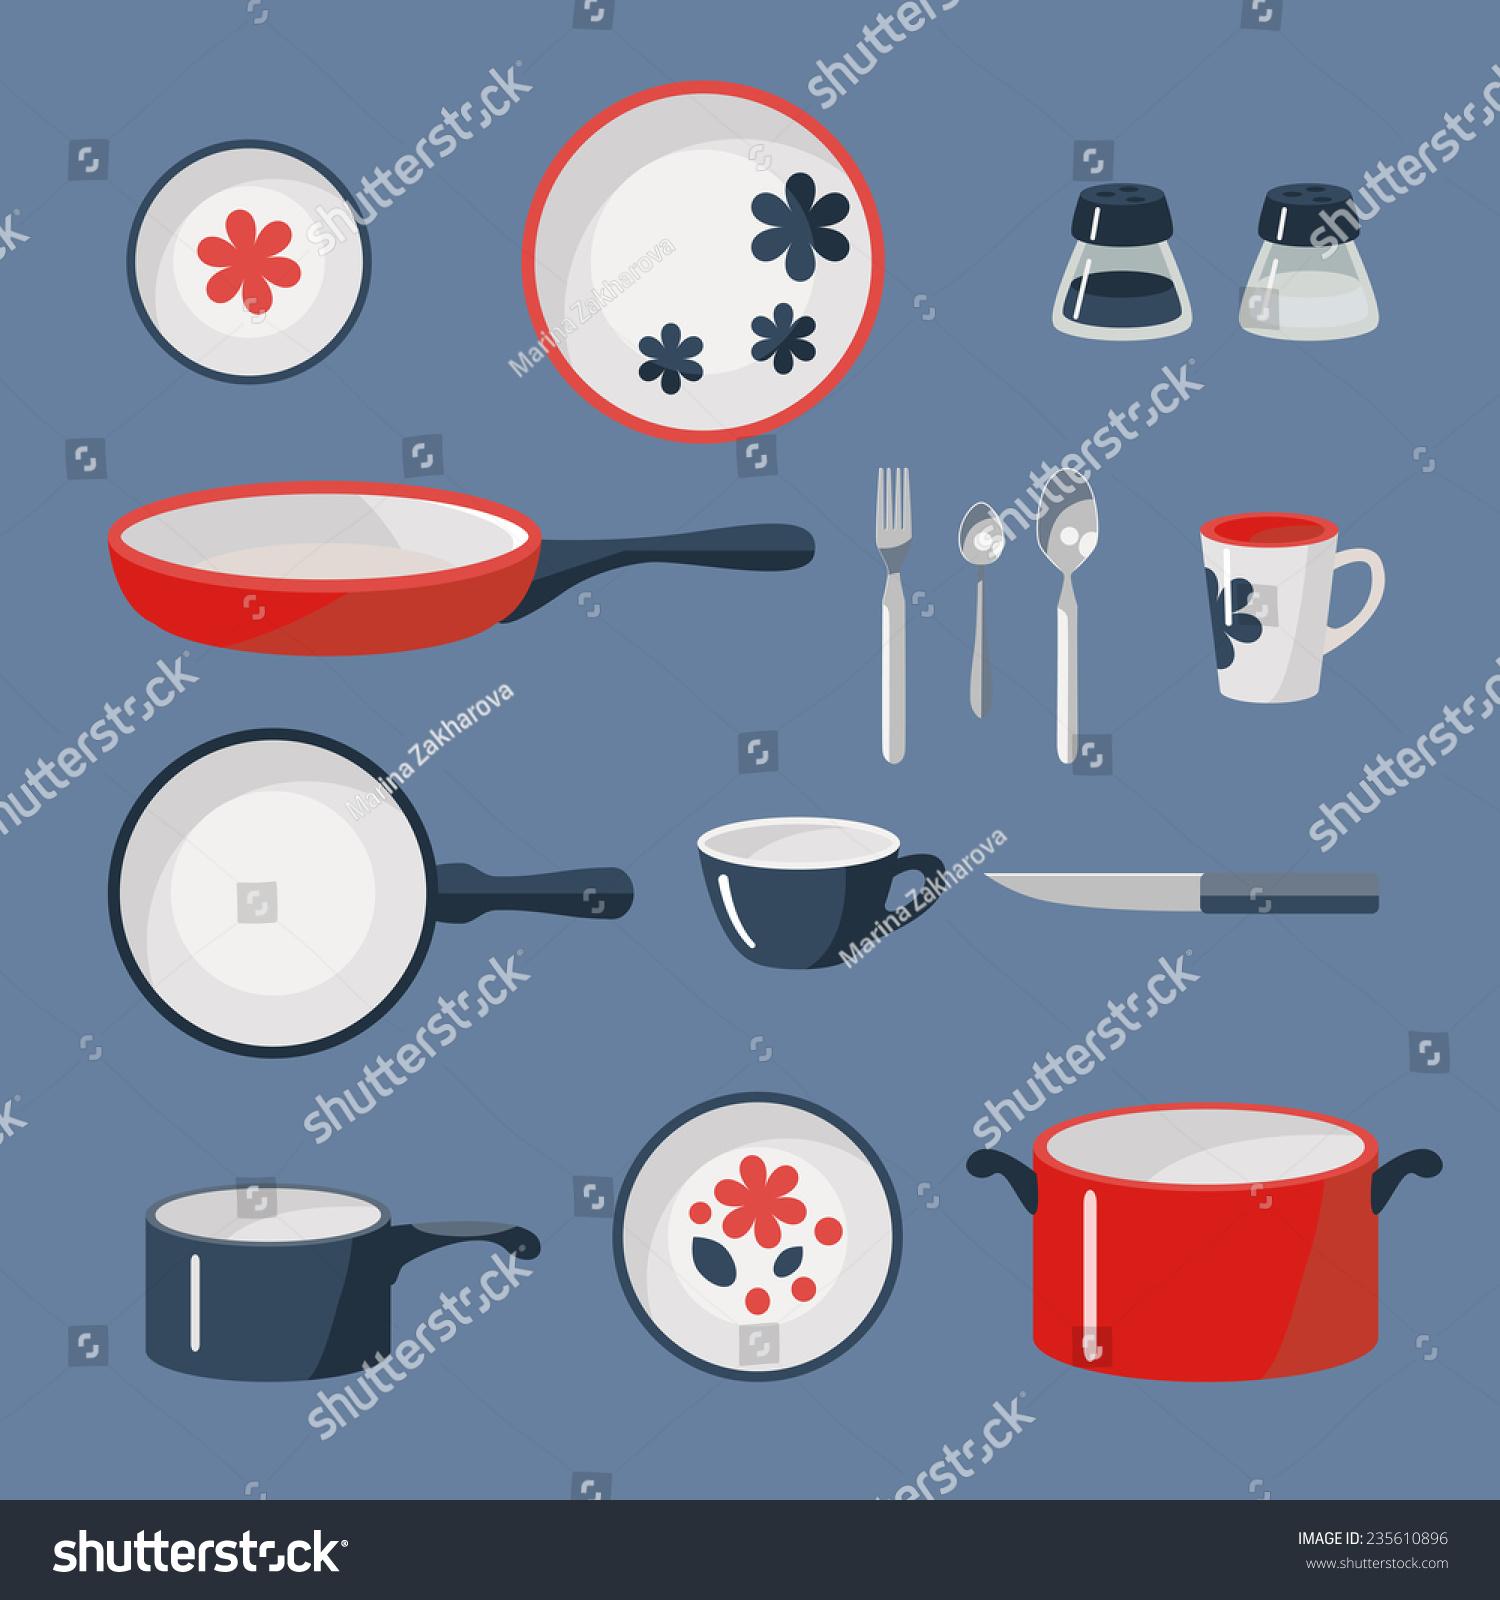 Vector Set Of Crockery And Kitchen Wares.